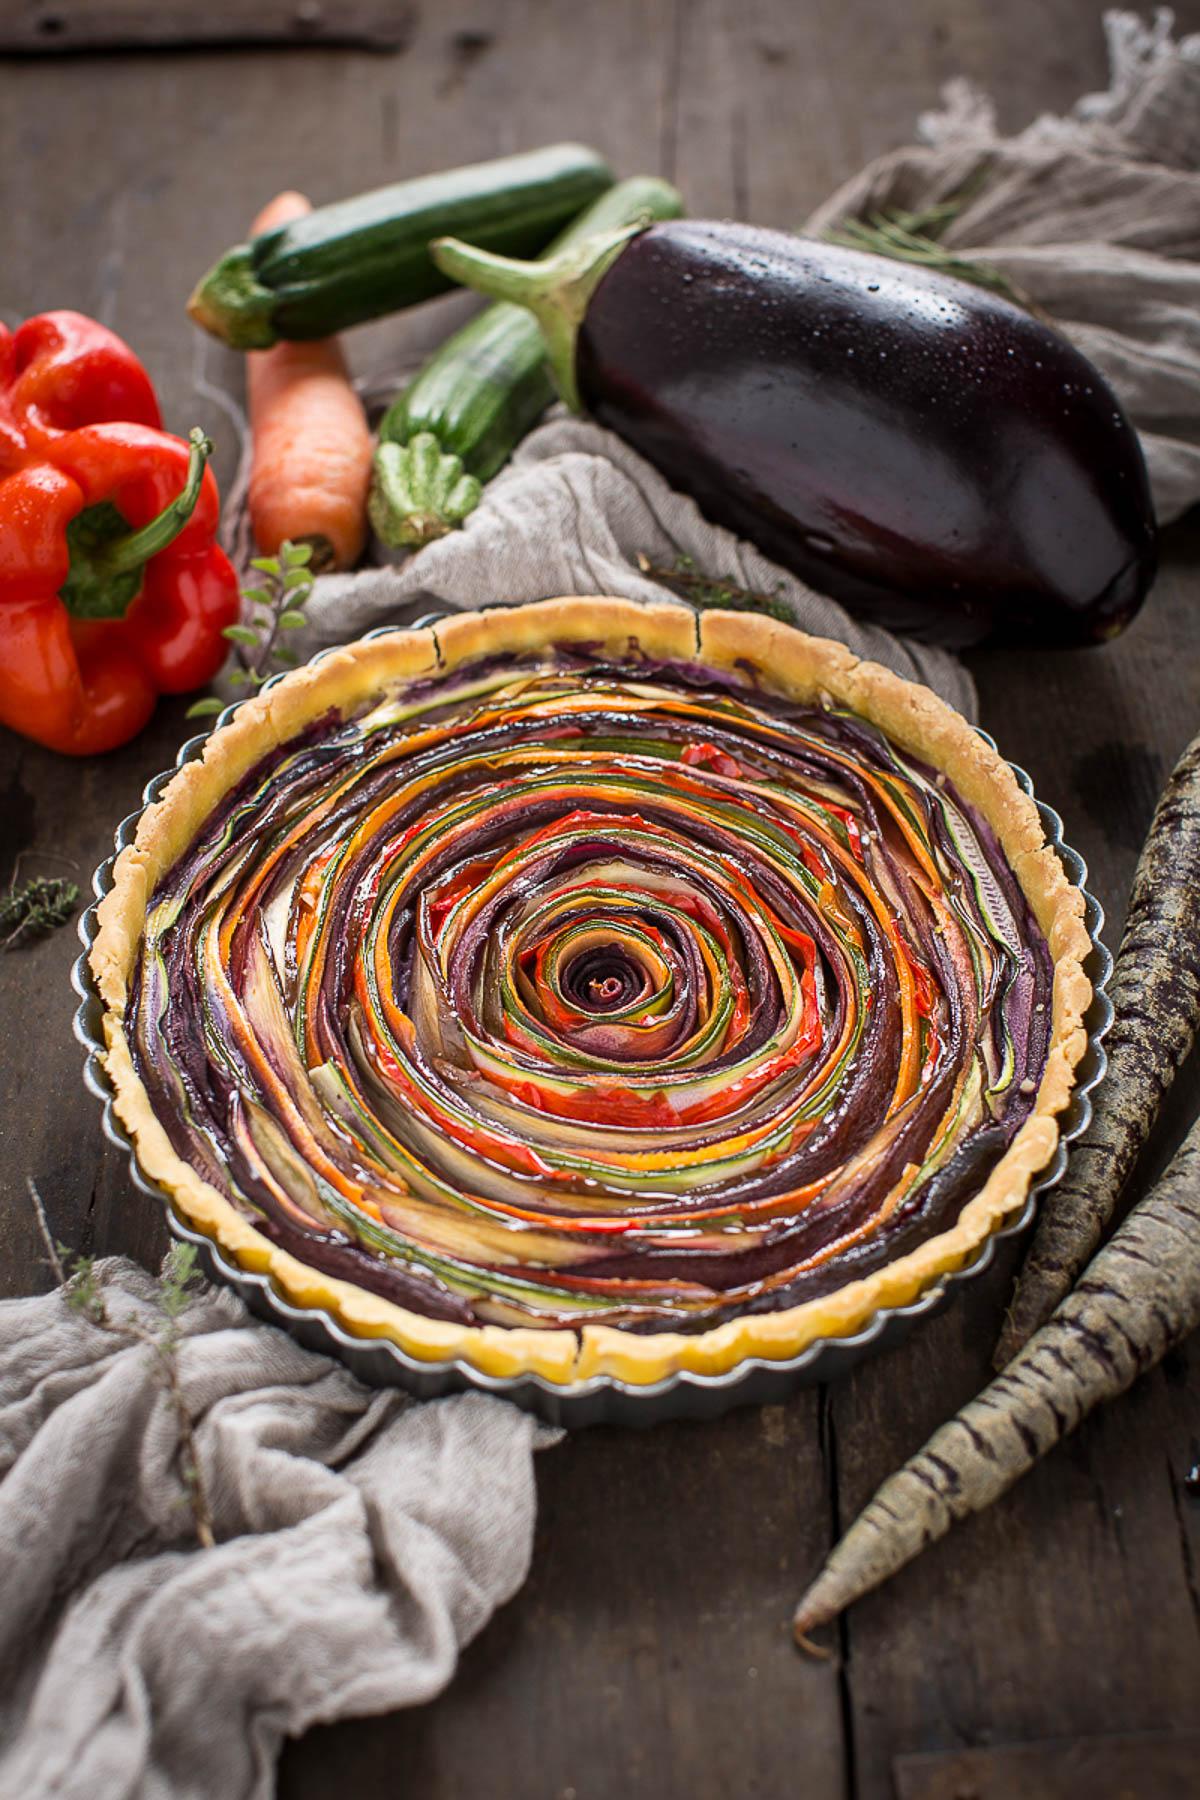 torta salata di verdure a spirale senza glutine senza uova senza burro #vegan | vegan glutenfree vegetable SPIRAL TART